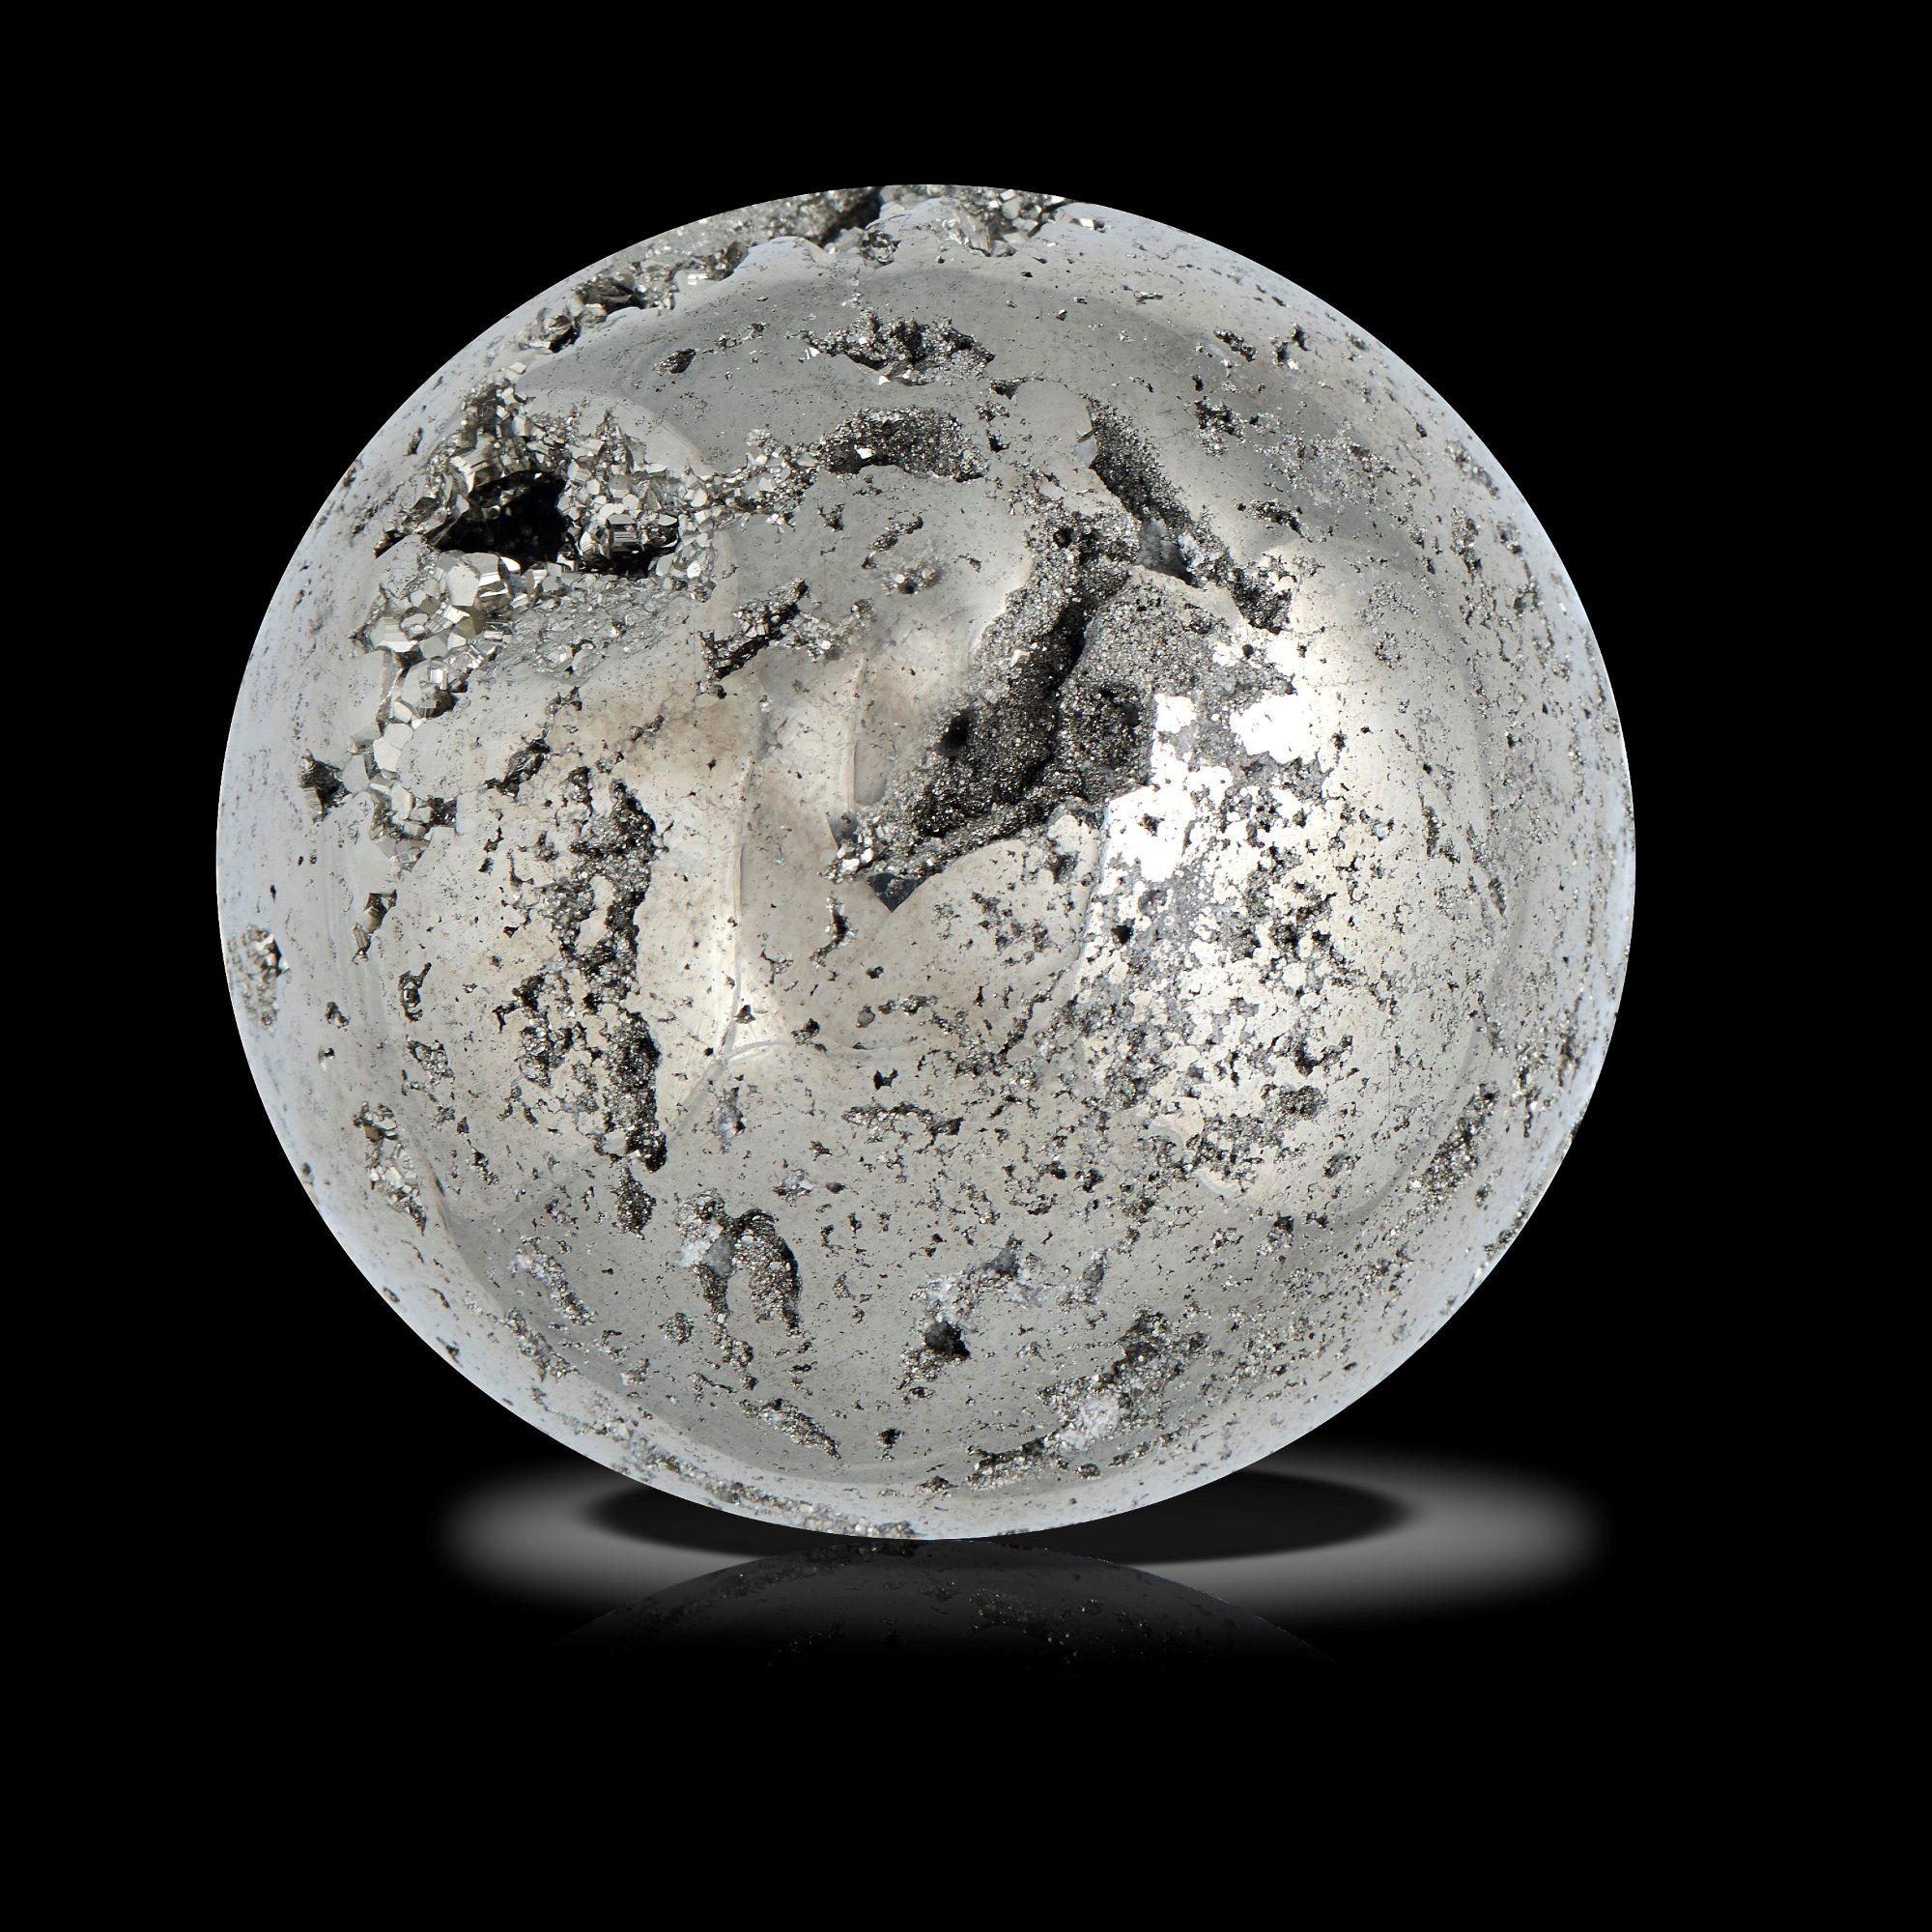 Lot 31 - Interior Design/Minerals: A collection of six mineral spheres, including Lapis lazuli, rose quartz